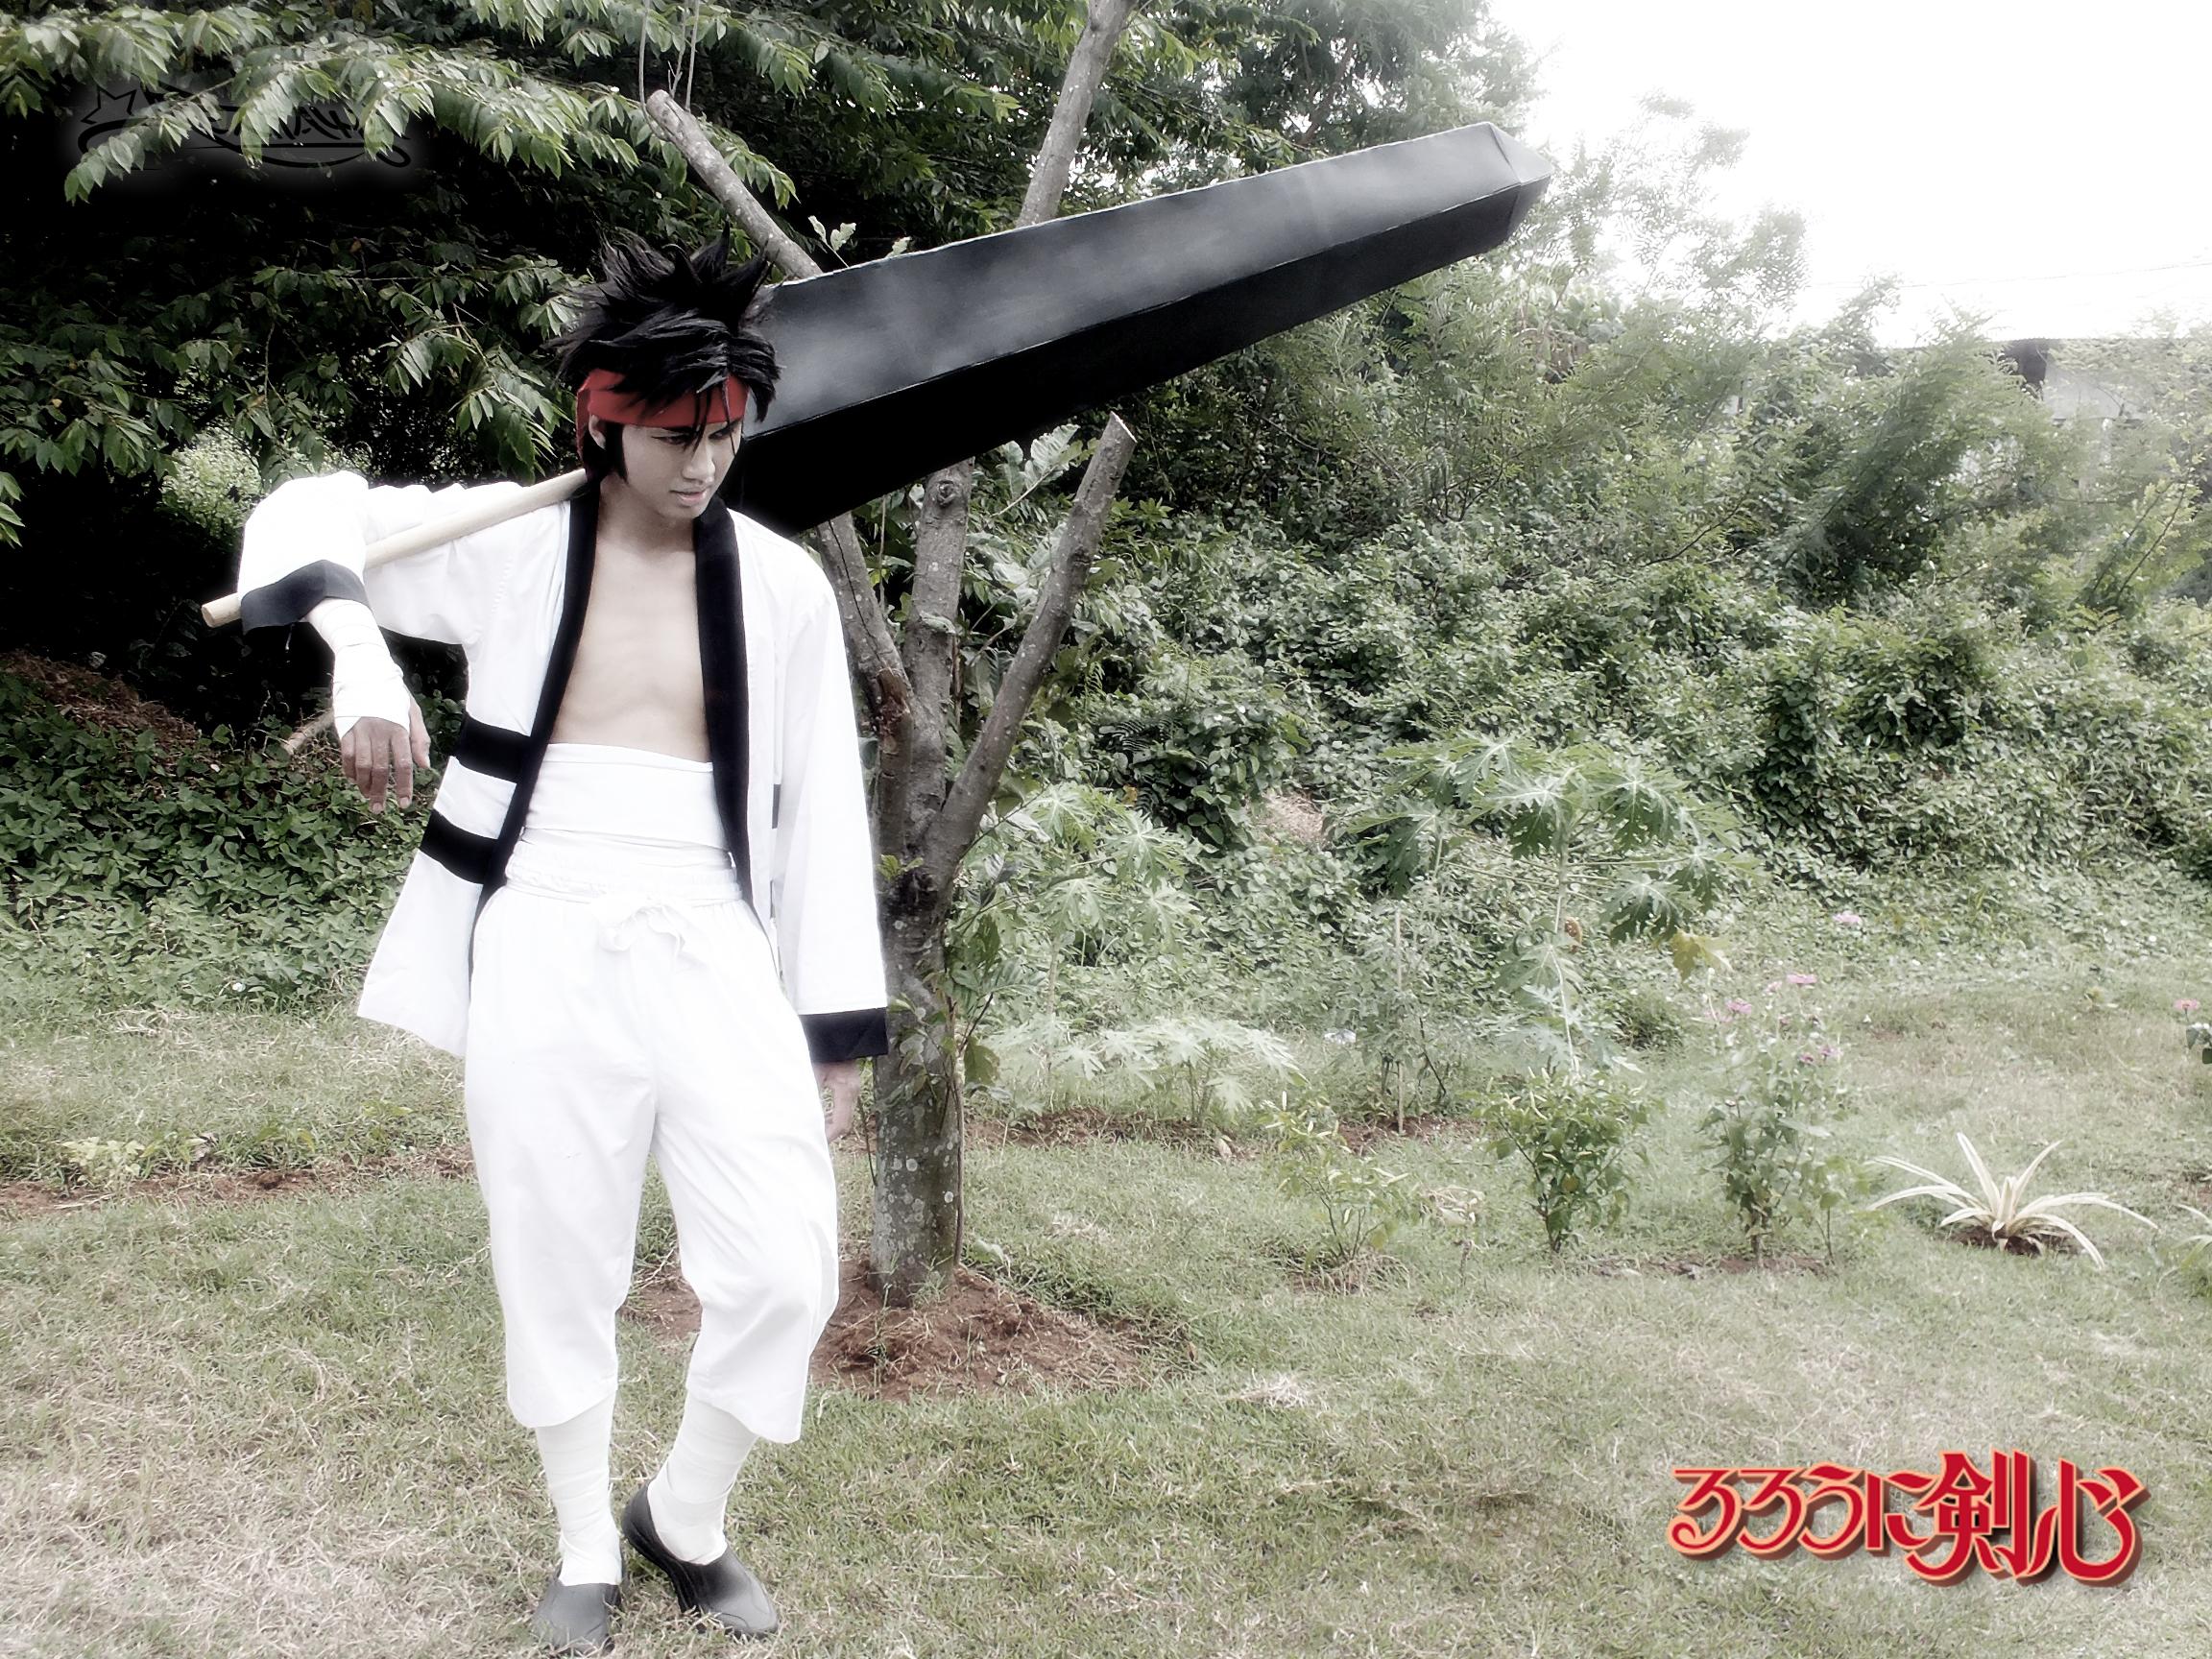 sanosuke sagara cosplay by rezhawa on deviantart